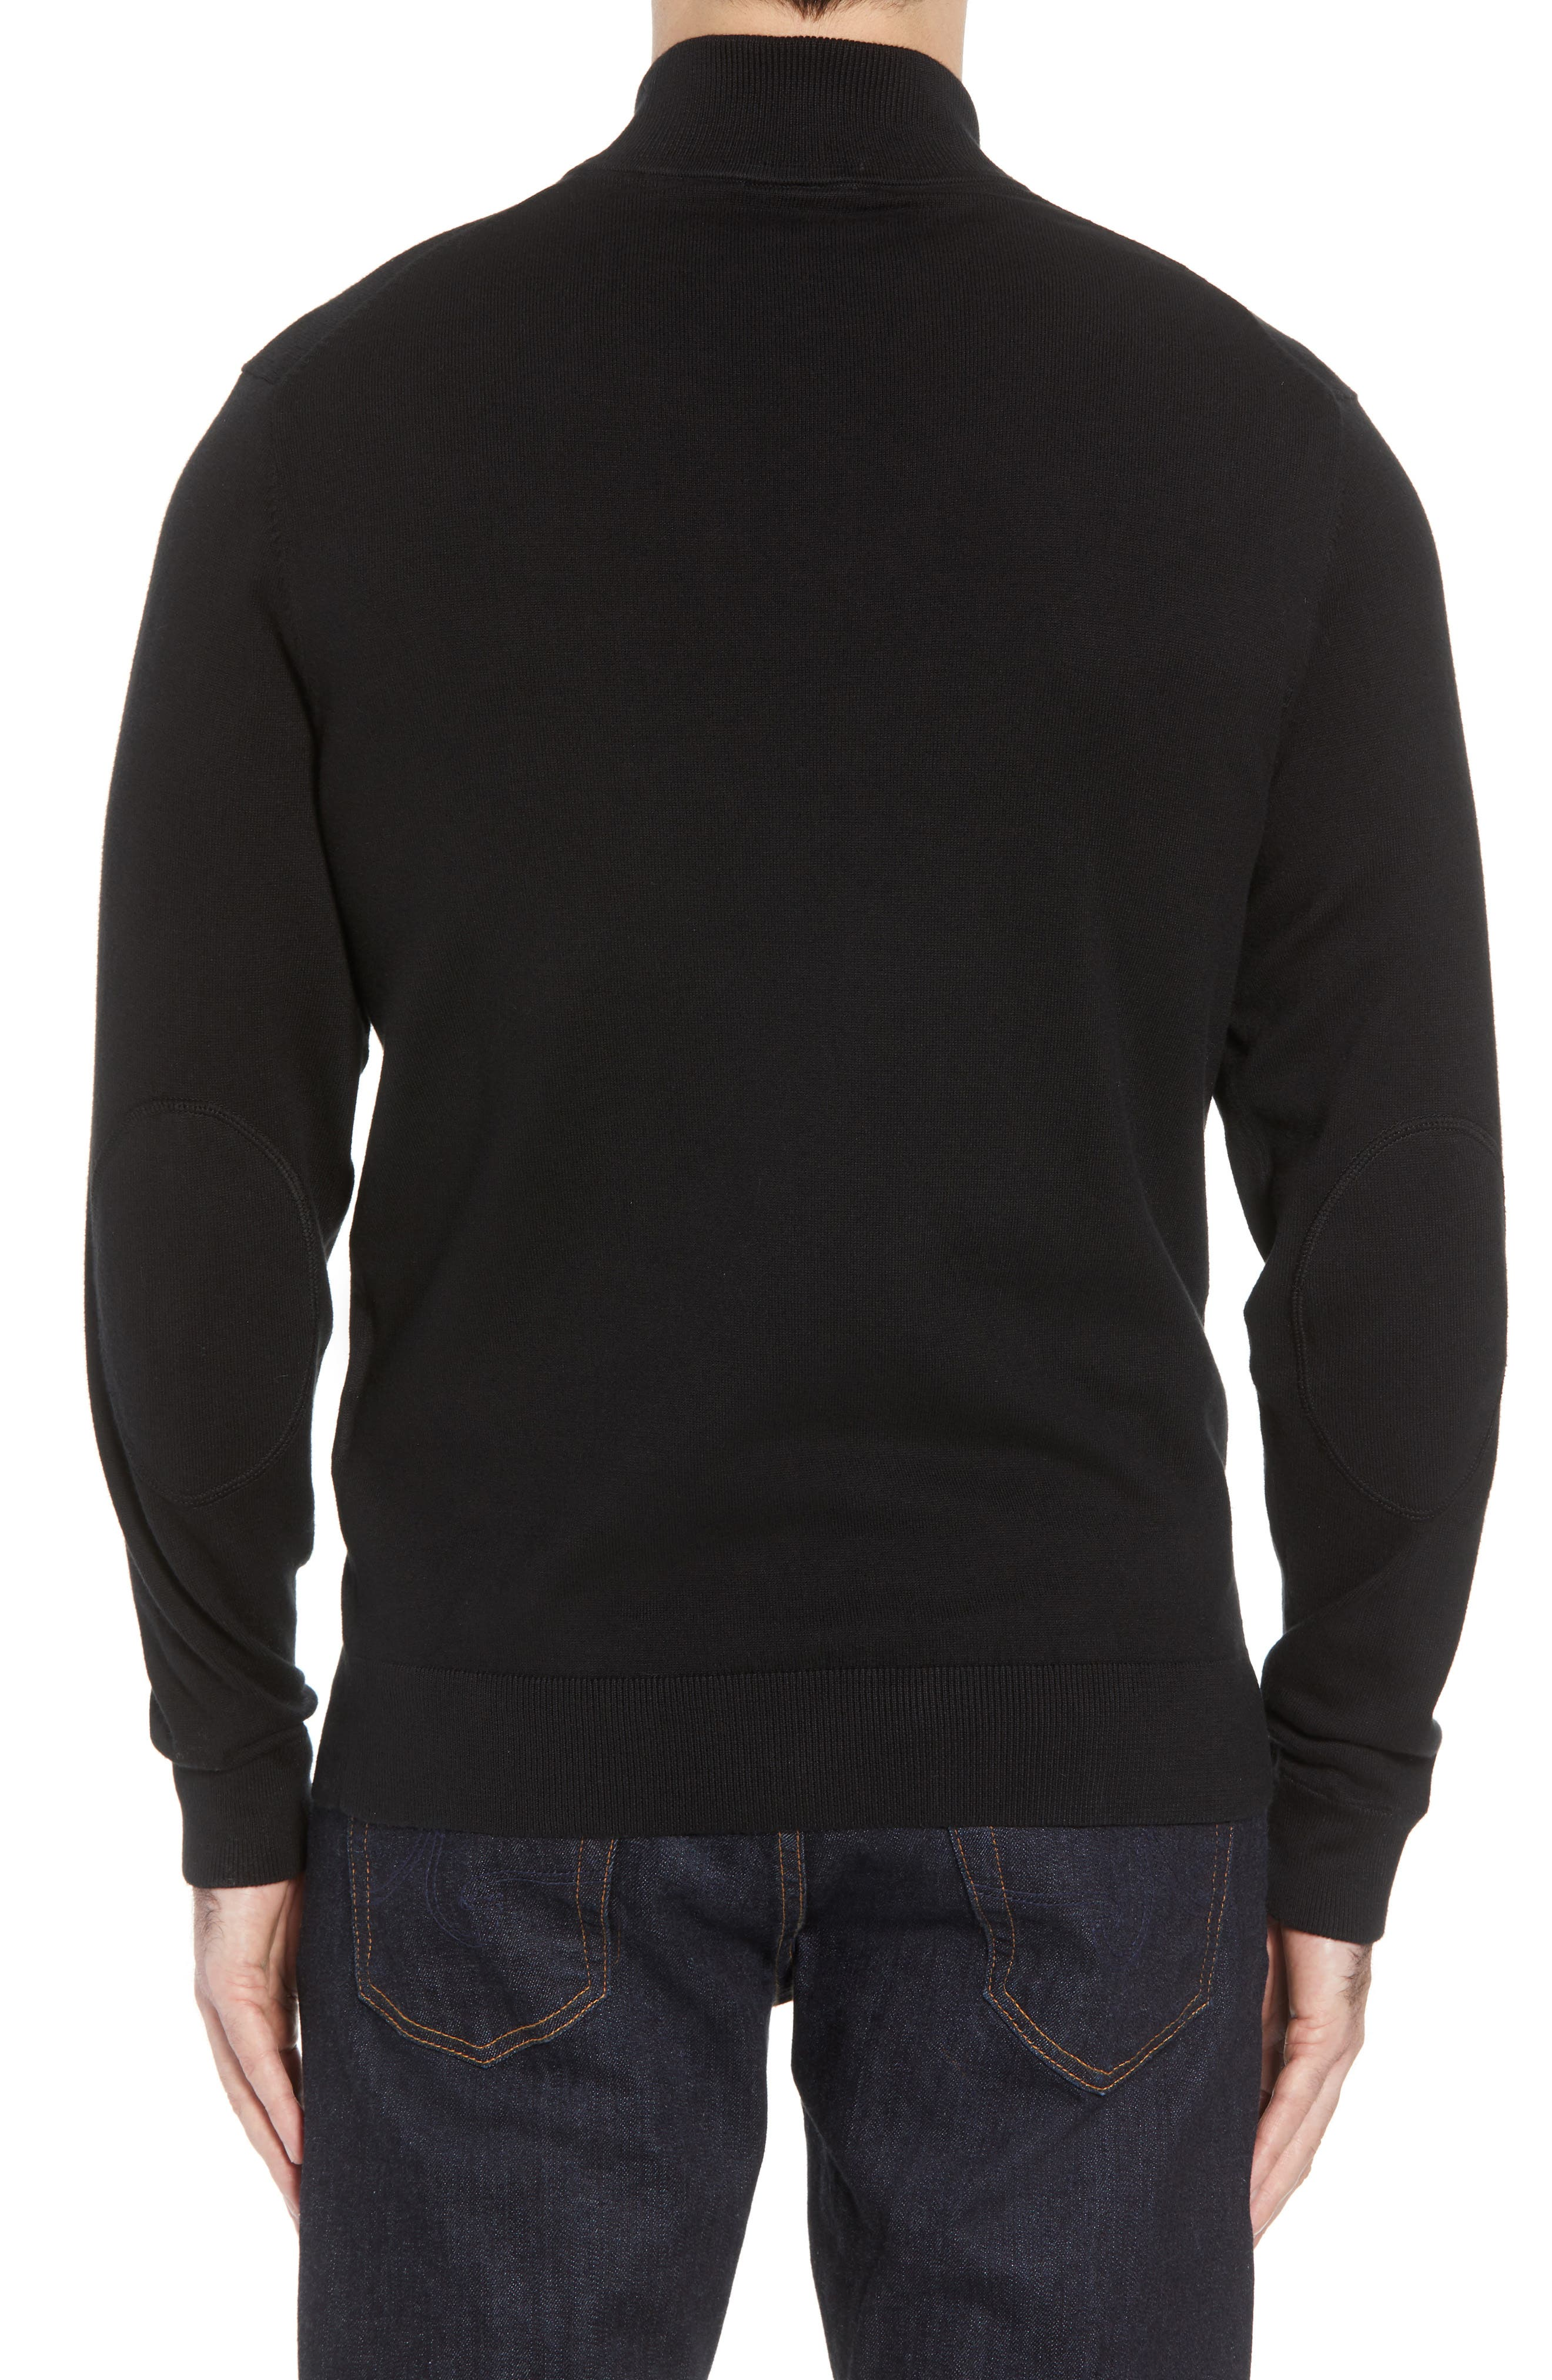 Washington - Lakemont Regular Fit Quarter Zip Sweater,                             Alternate thumbnail 2, color,                             BLACK